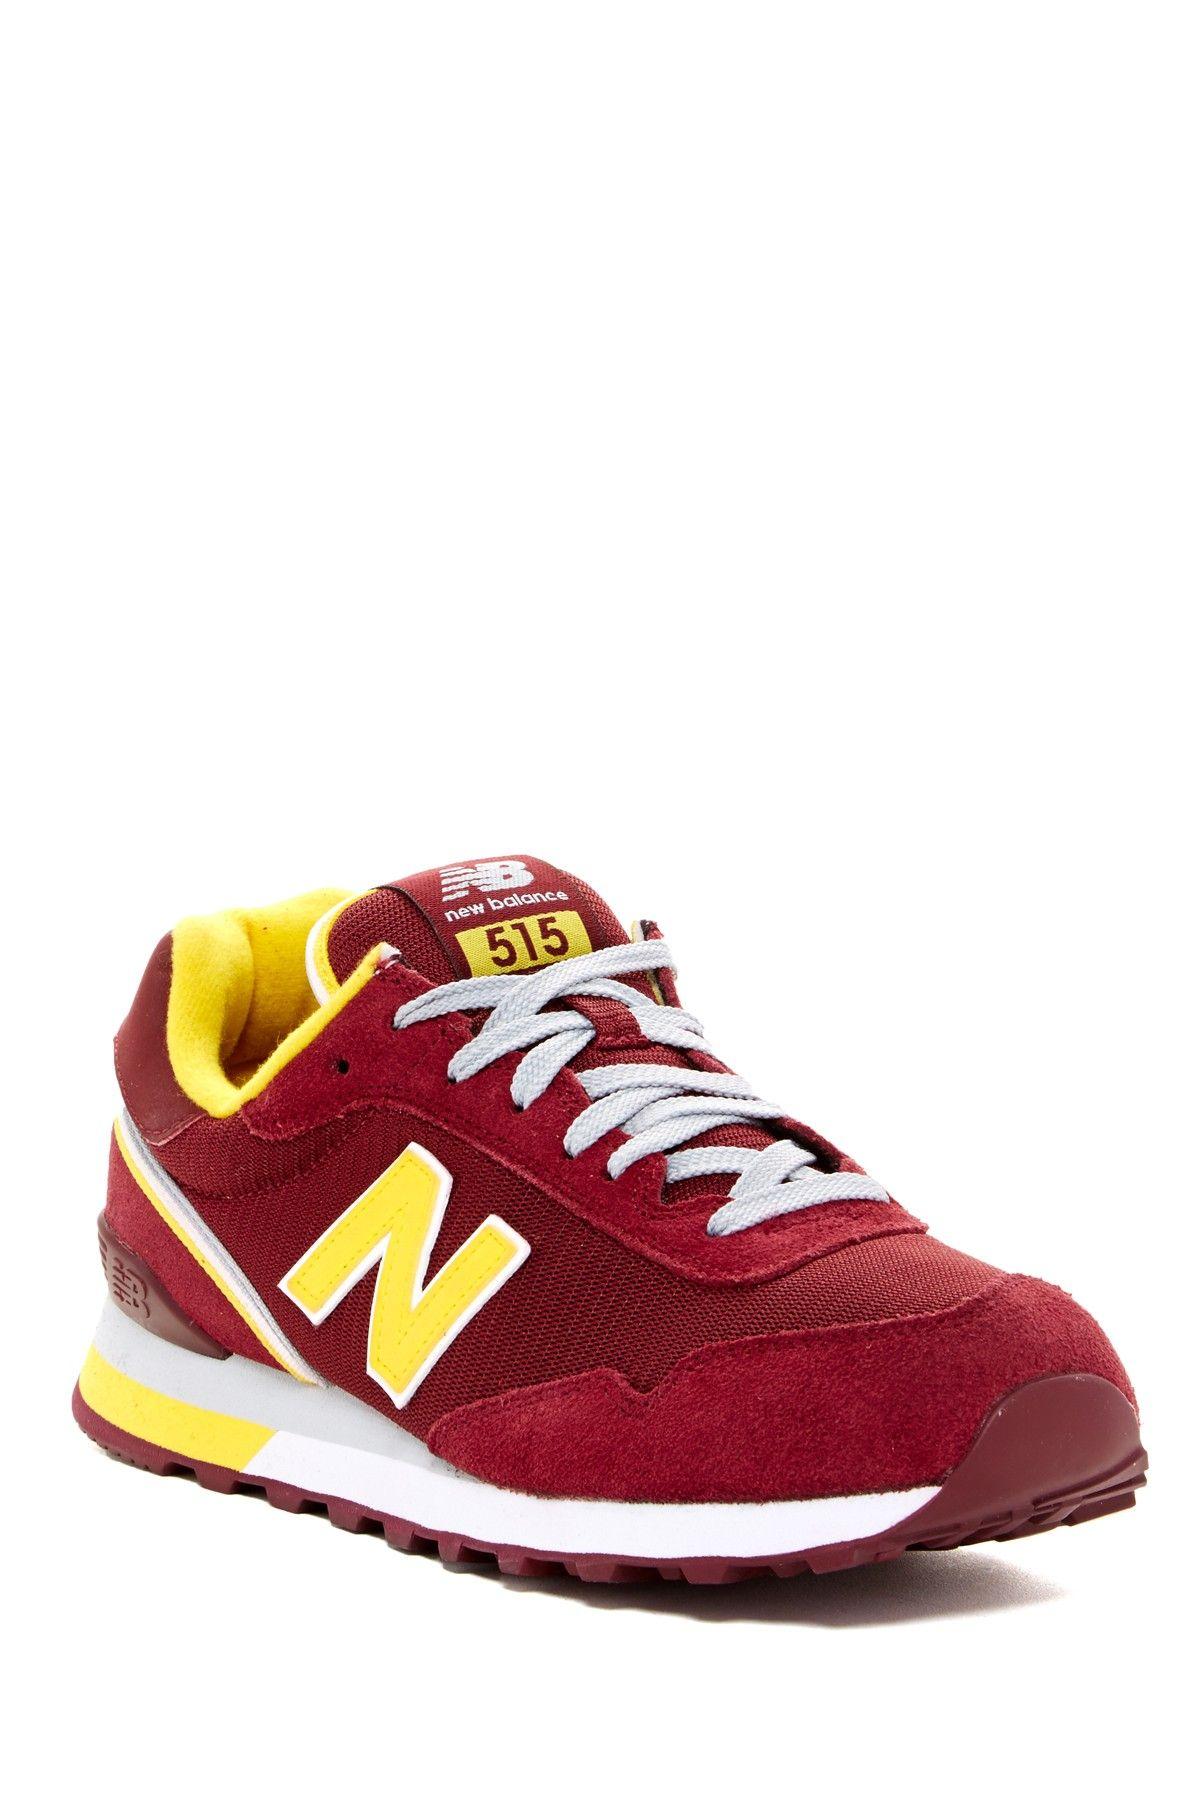 Cool. New Balance 515 Classic Sneaker